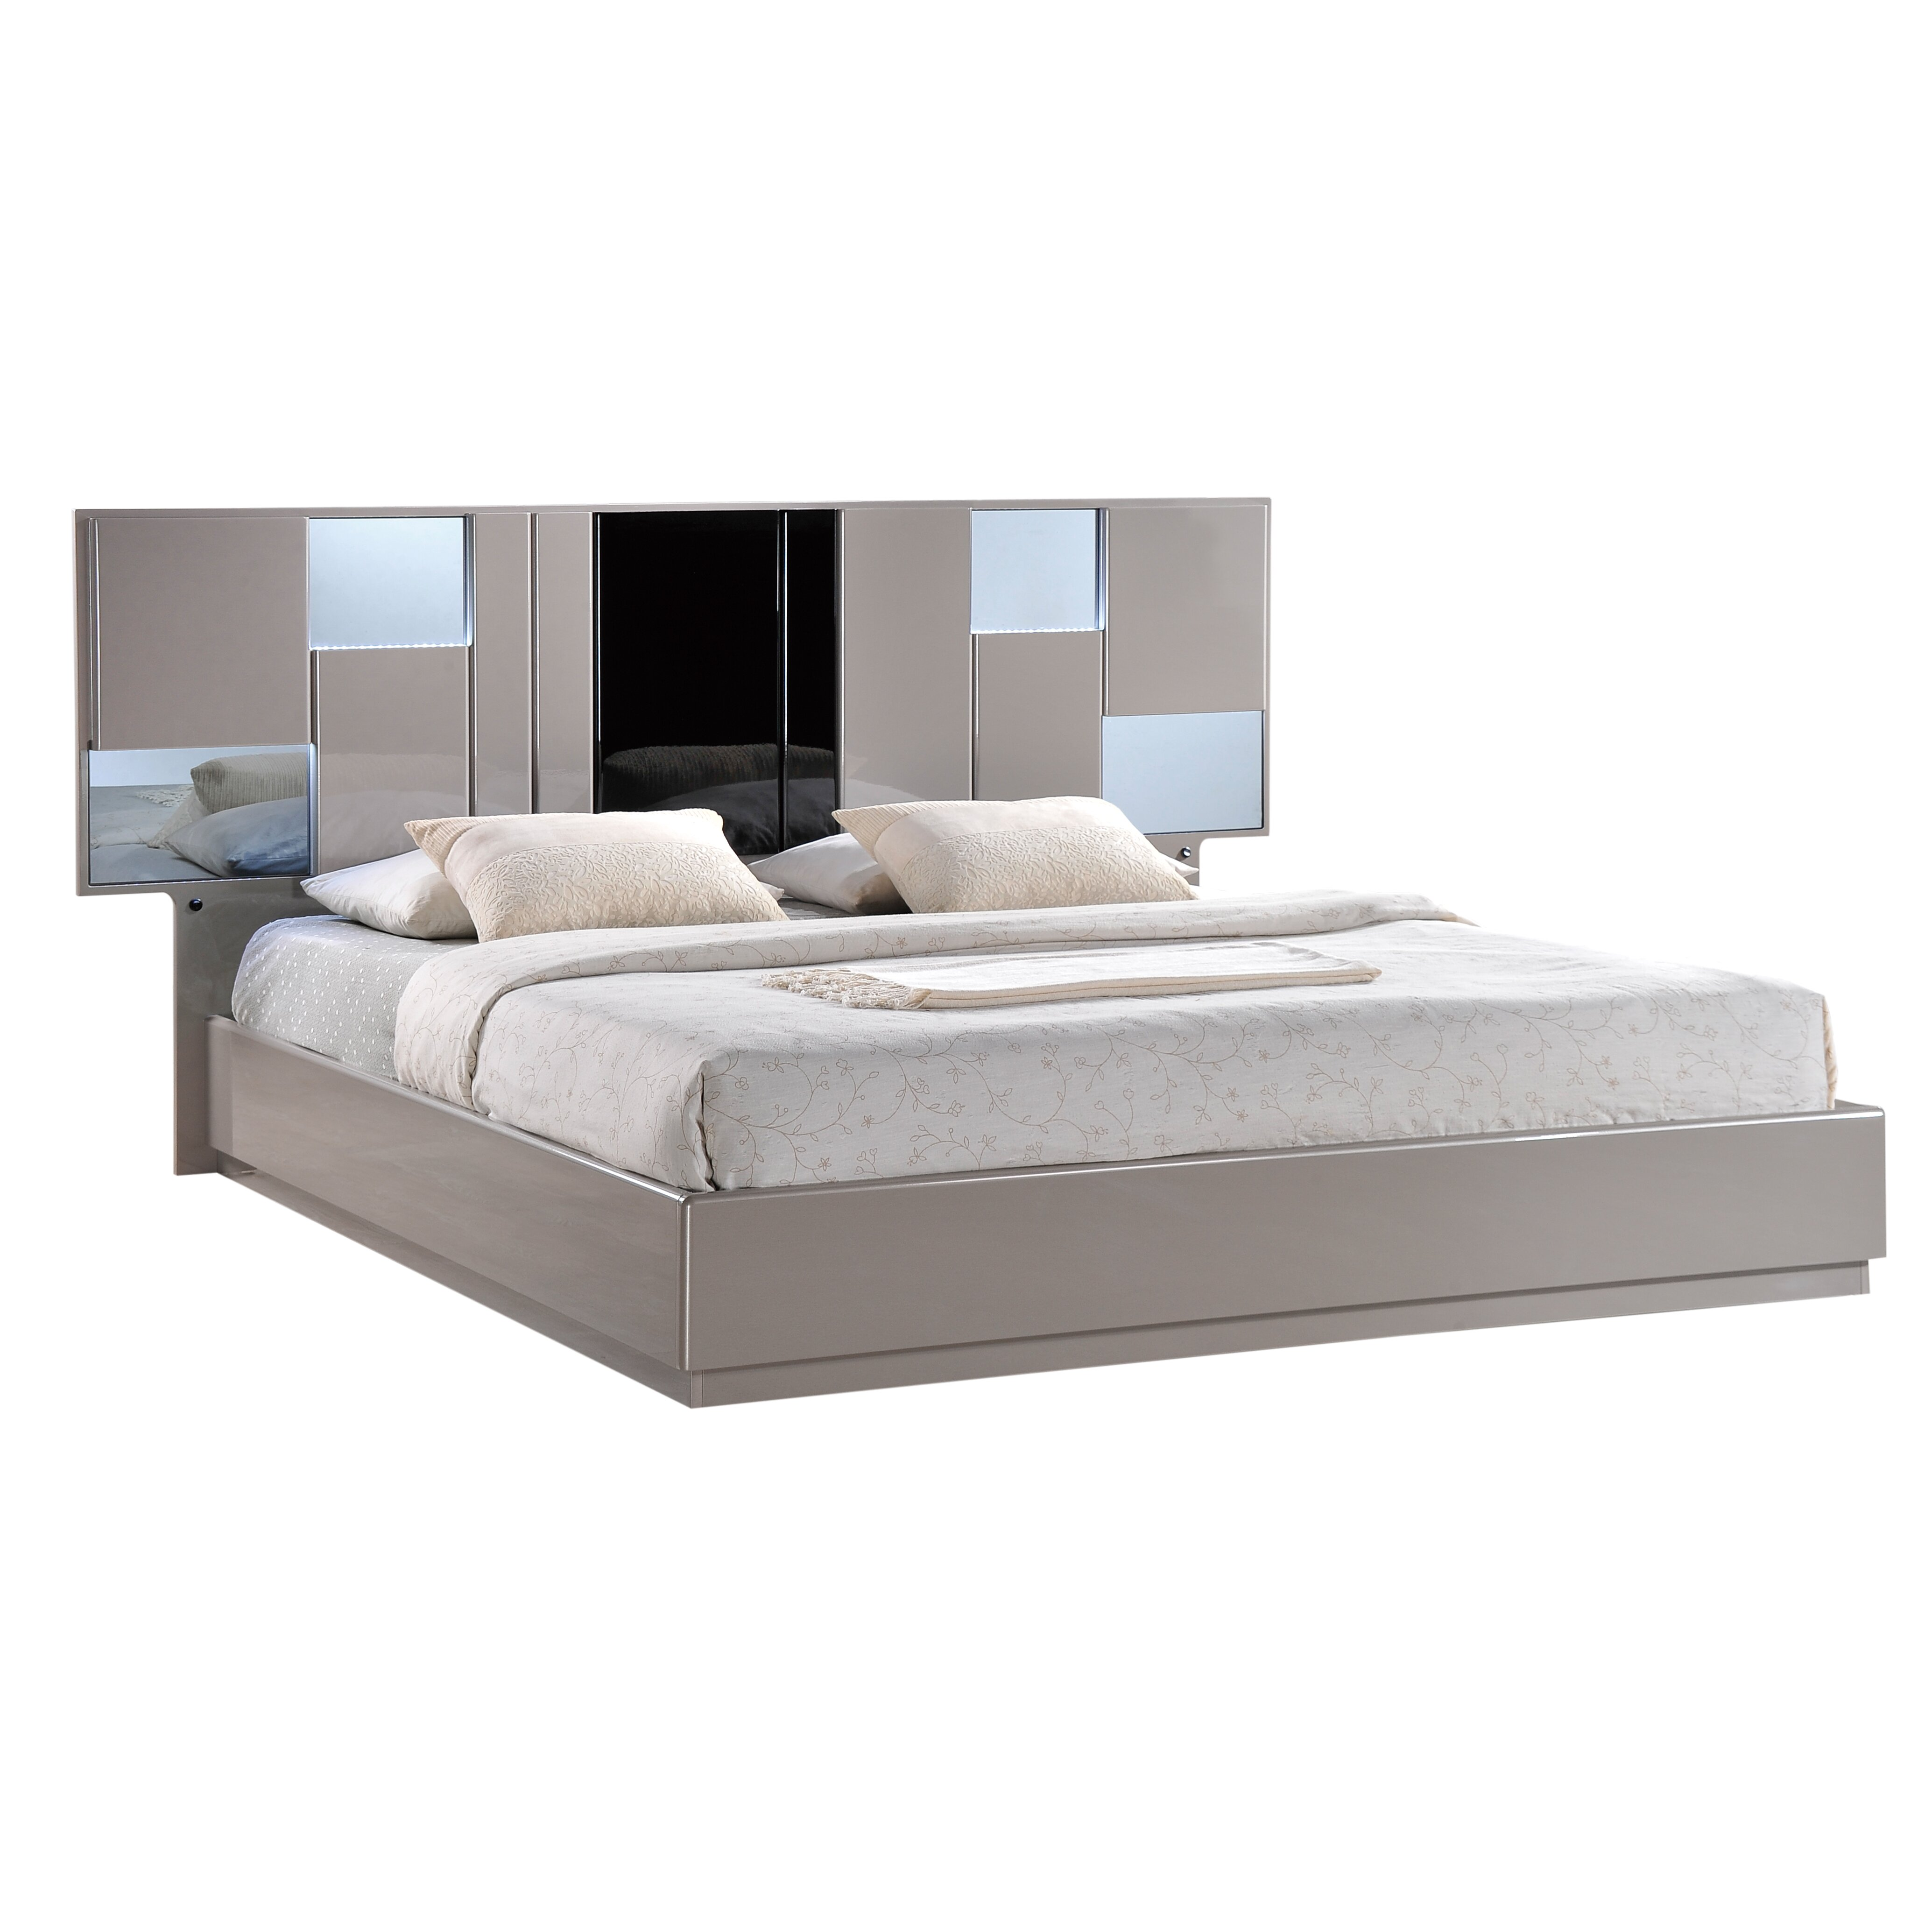 Global Bedroom Furniture Global Furniture Usa Bianca Panel Customizable Bedroom Set